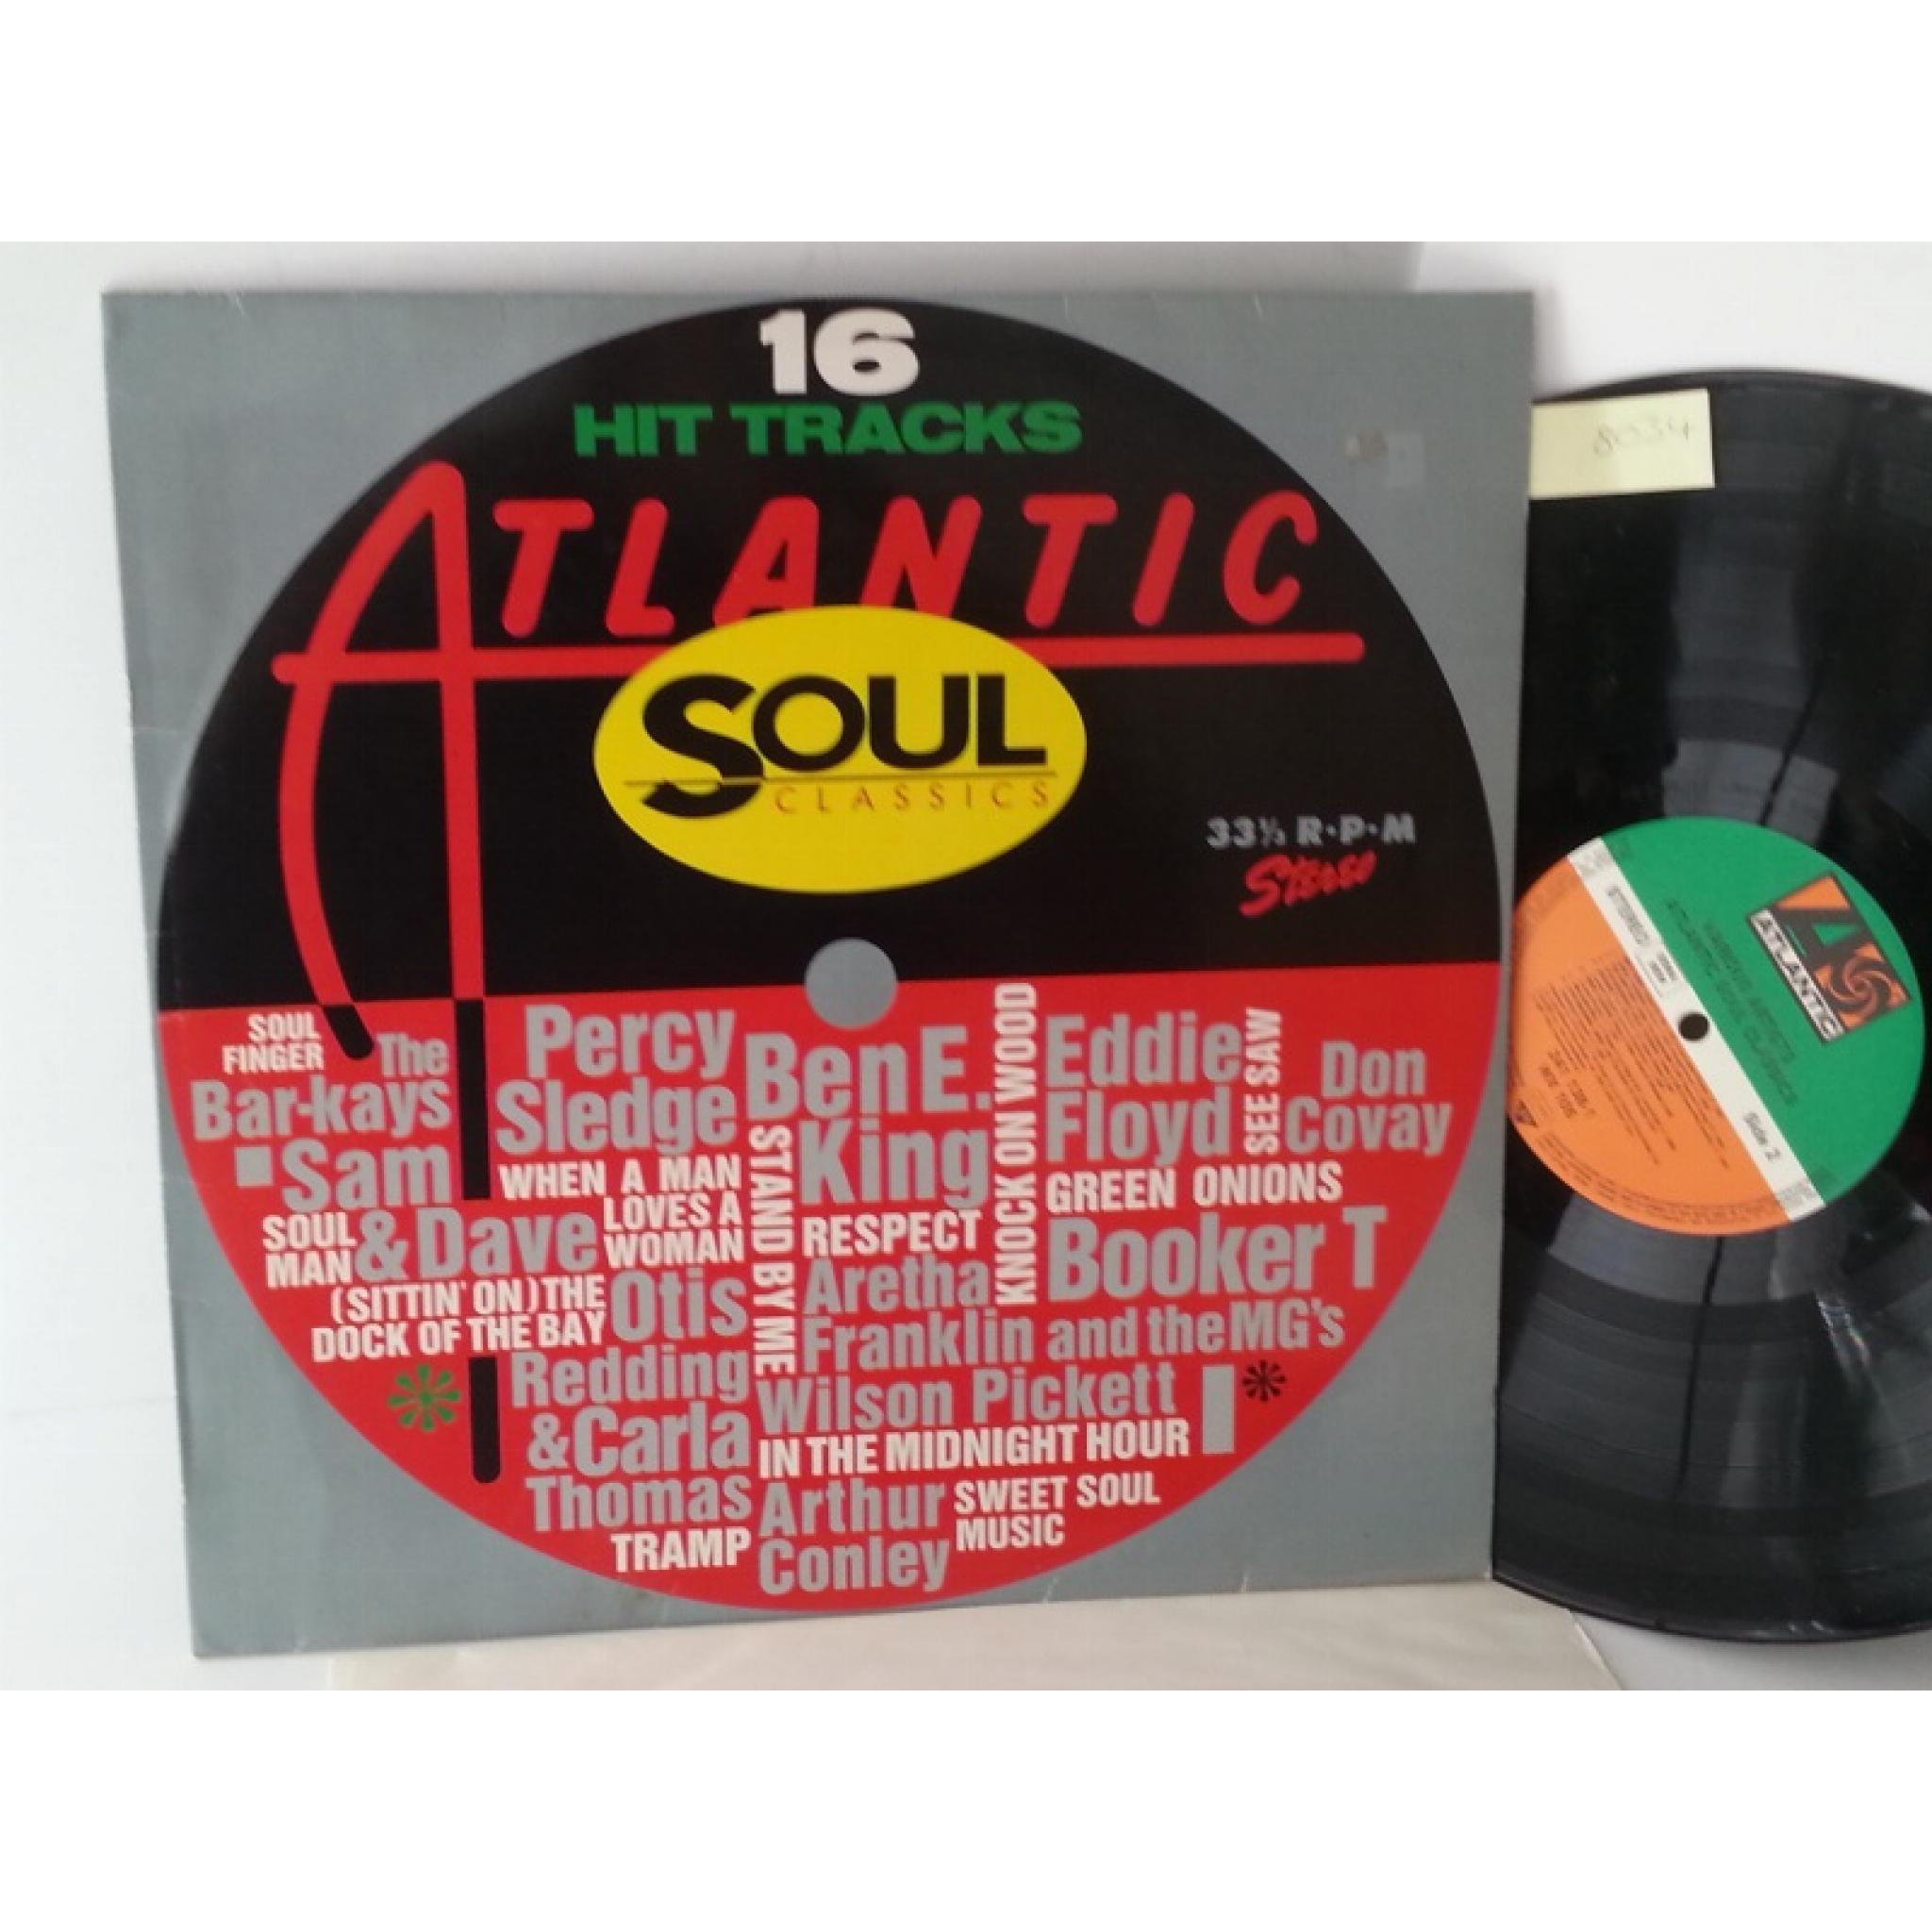 Atlantic Soul Classics